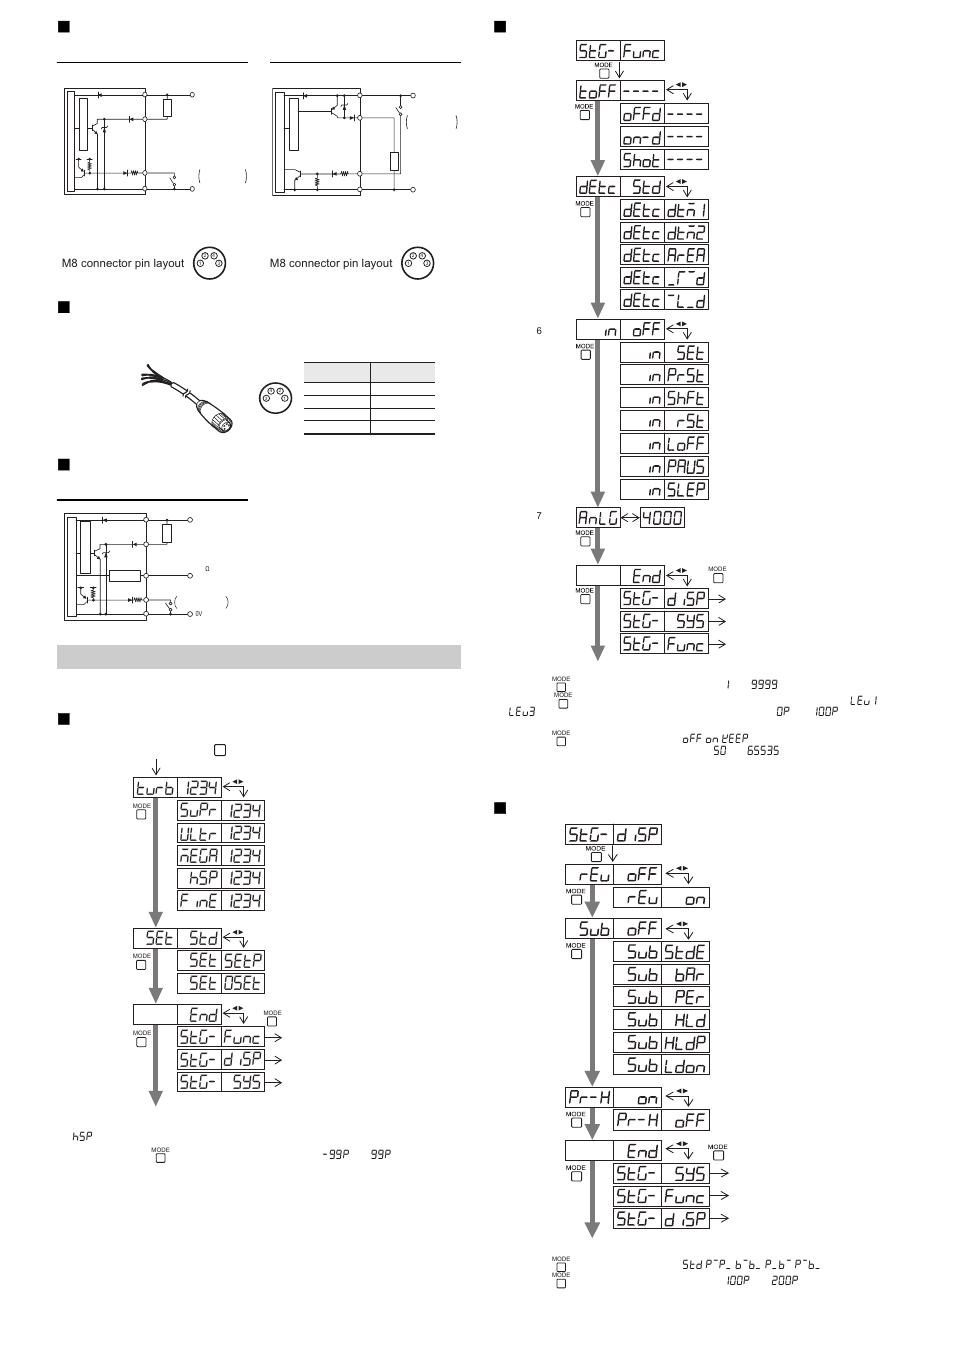 M8 connector type, Lv-n11cn / n12cn, Lv-n11cp / n12cp